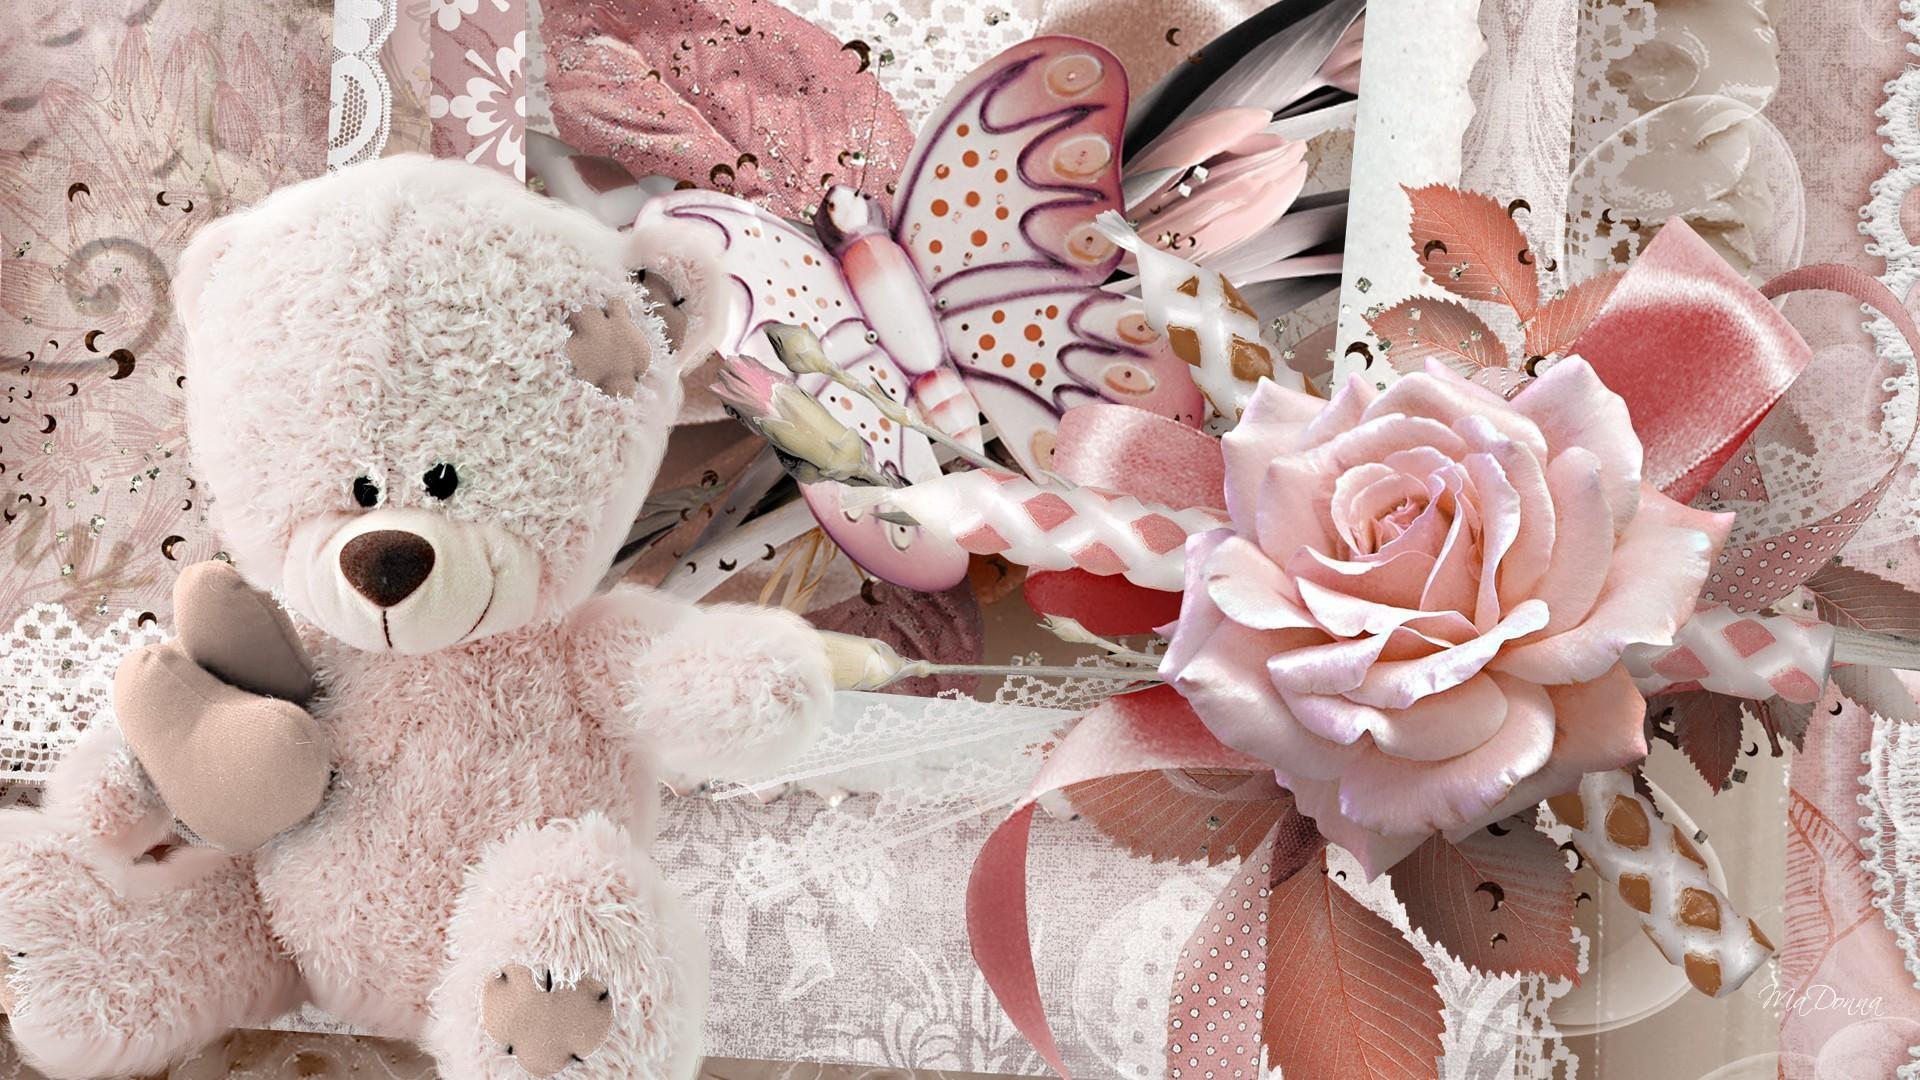 Teddy bear wallpaper and screensavers 65 images - Free teddy bear pics ...